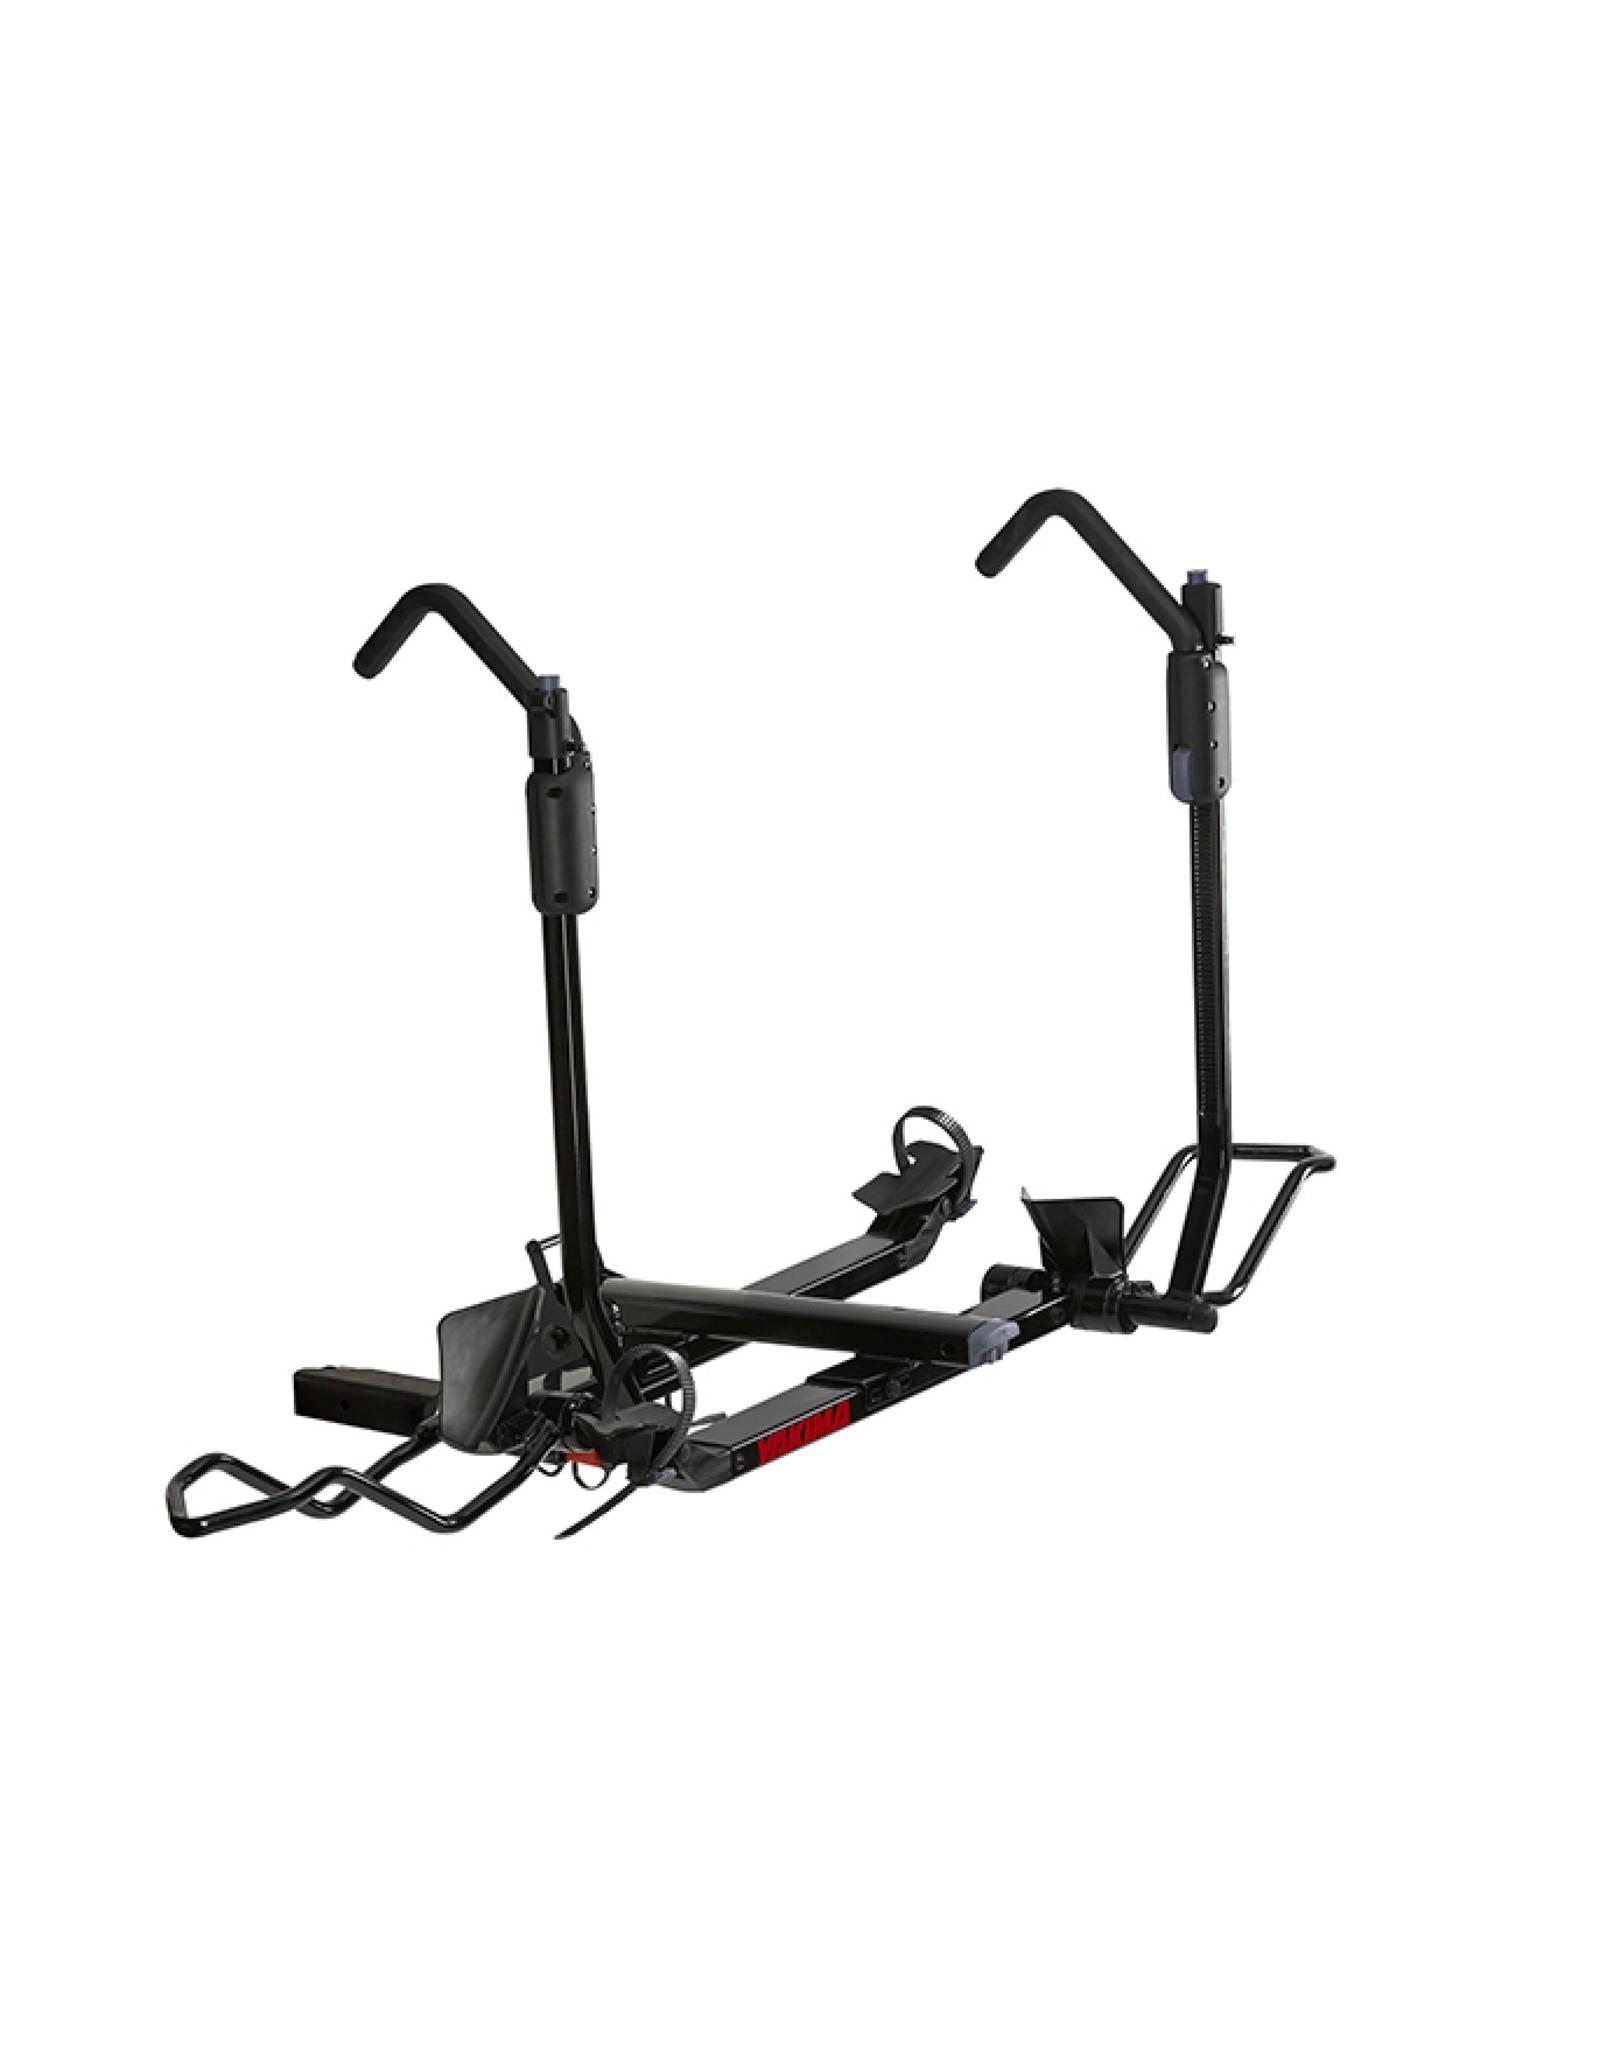 YAKIMA YAKIMA - HoldUp EVO 2 - Premium Tray Hitch Bike Rack